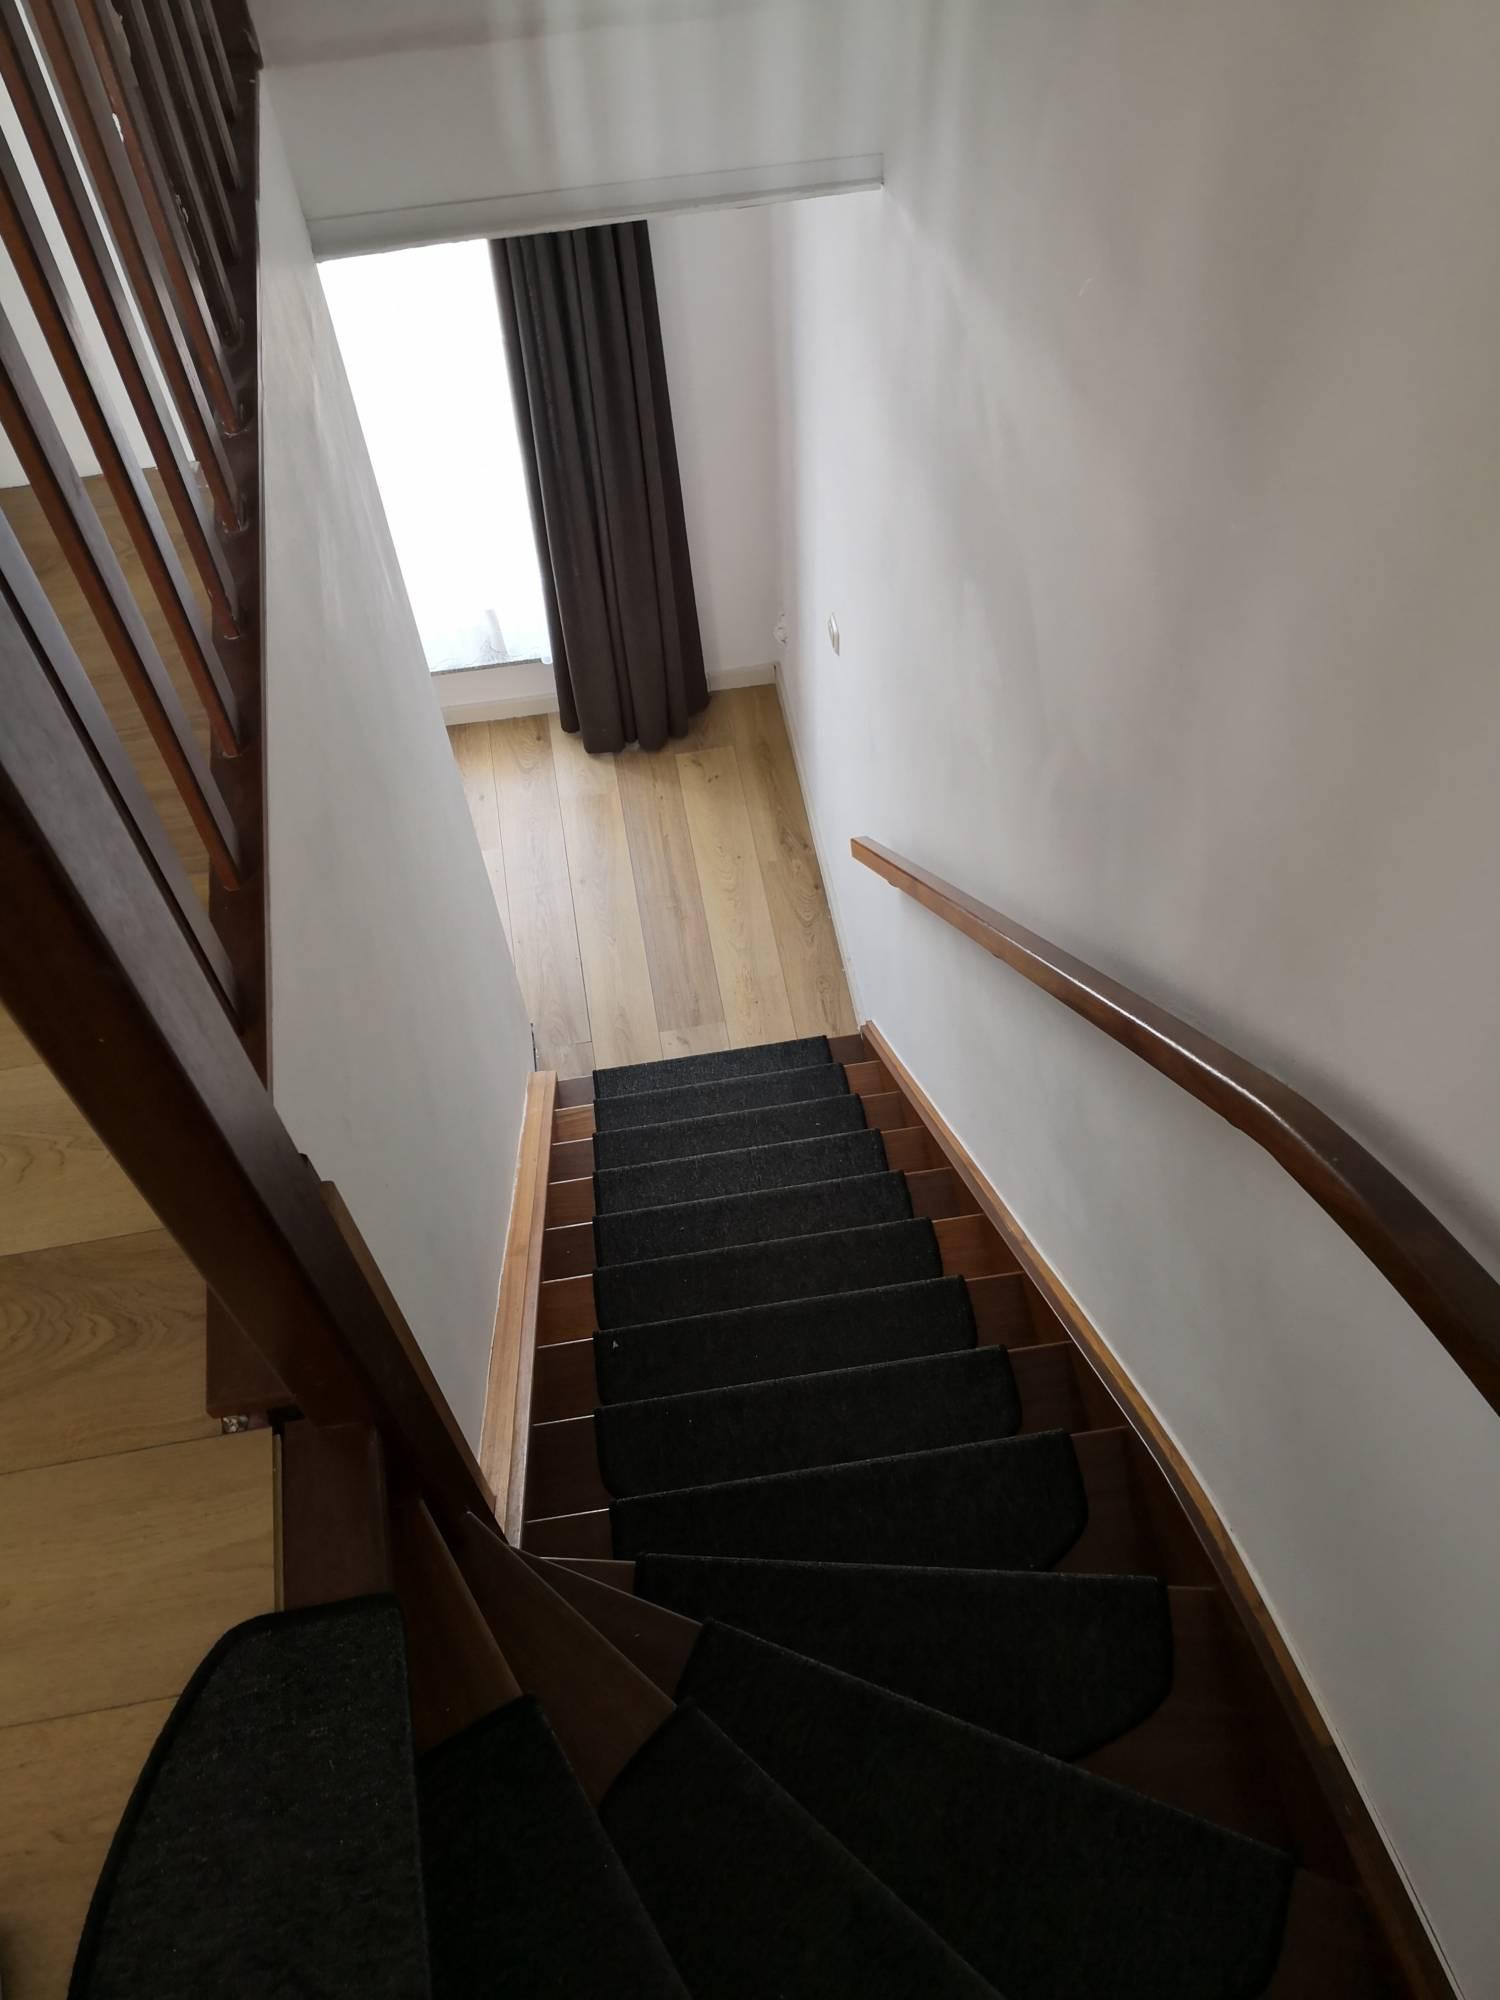 maisonnette schuitenberg roermond mieten. Black Bedroom Furniture Sets. Home Design Ideas